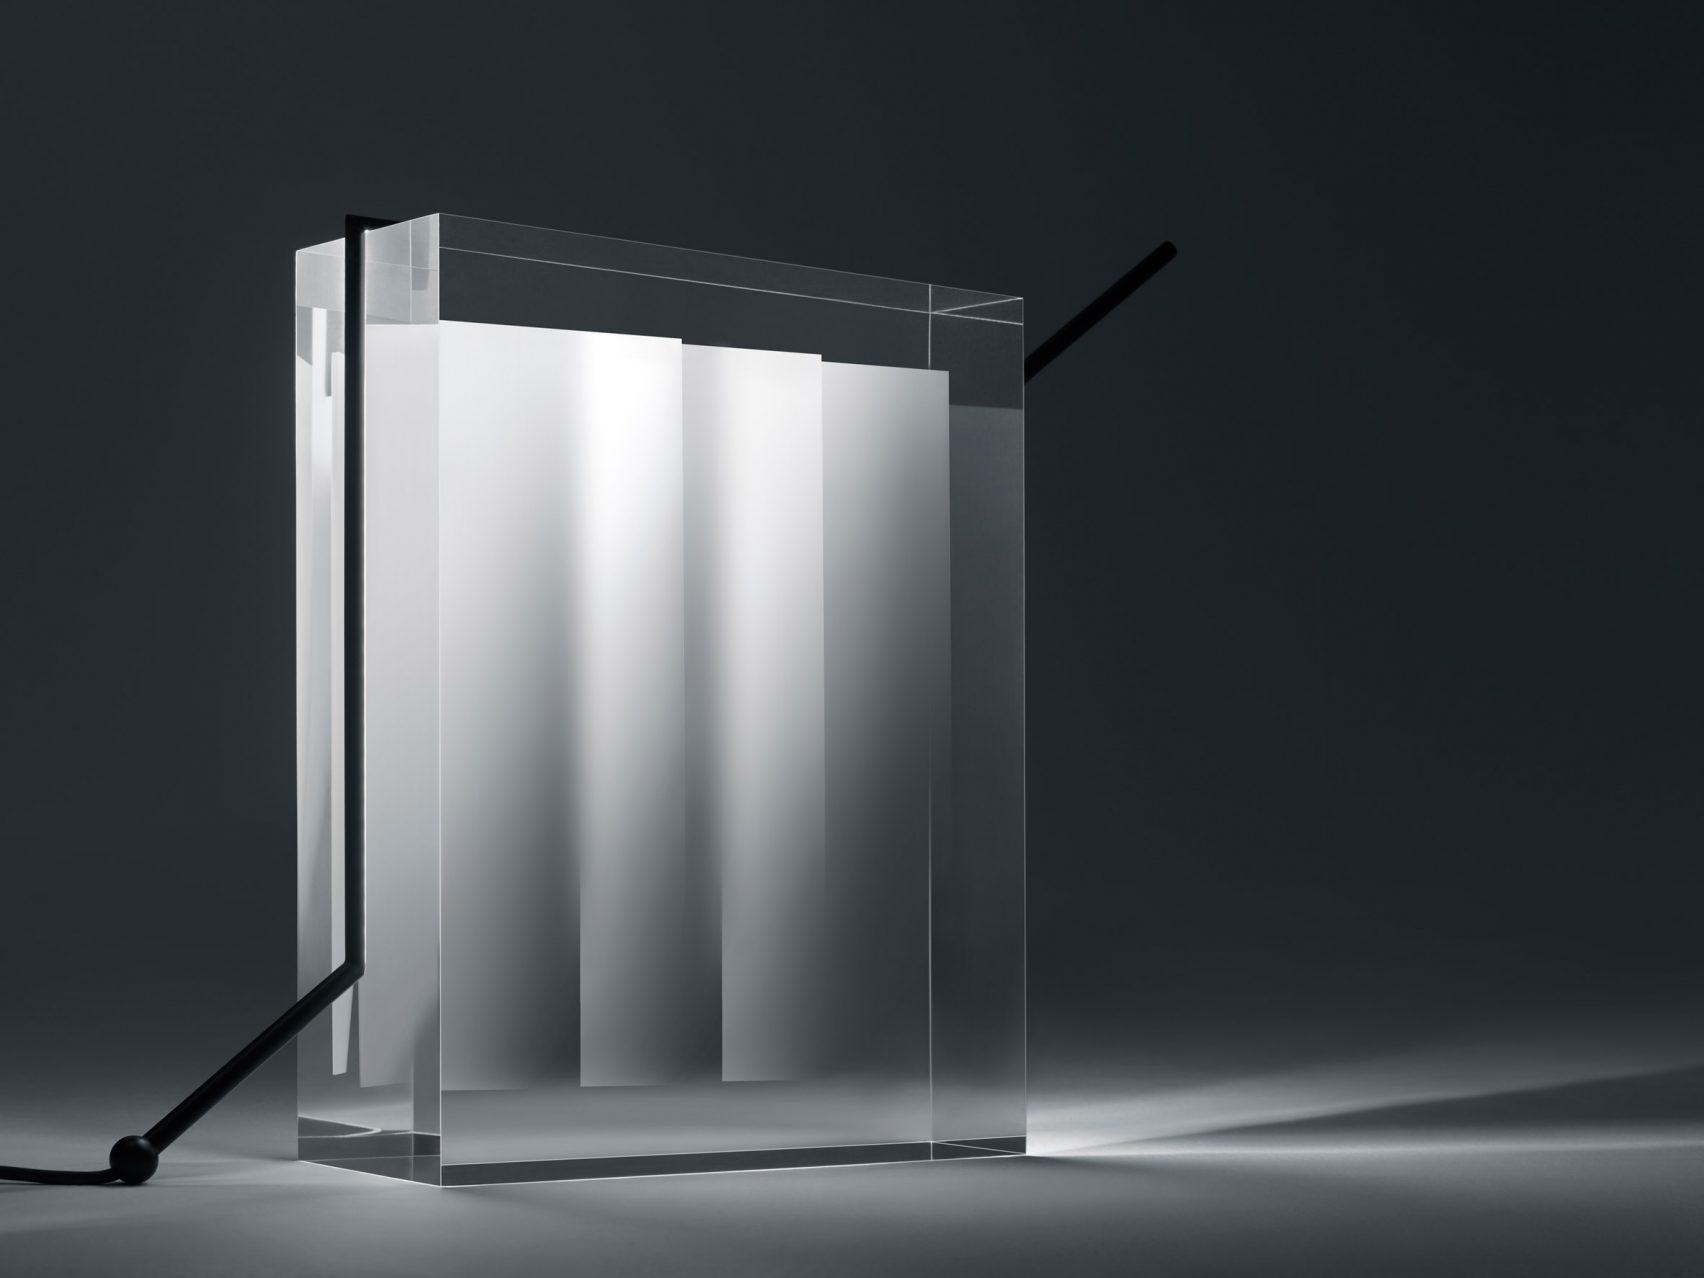 Трибьют Исаму Ногучи от студии Nendo (галерея 4, фото 5)